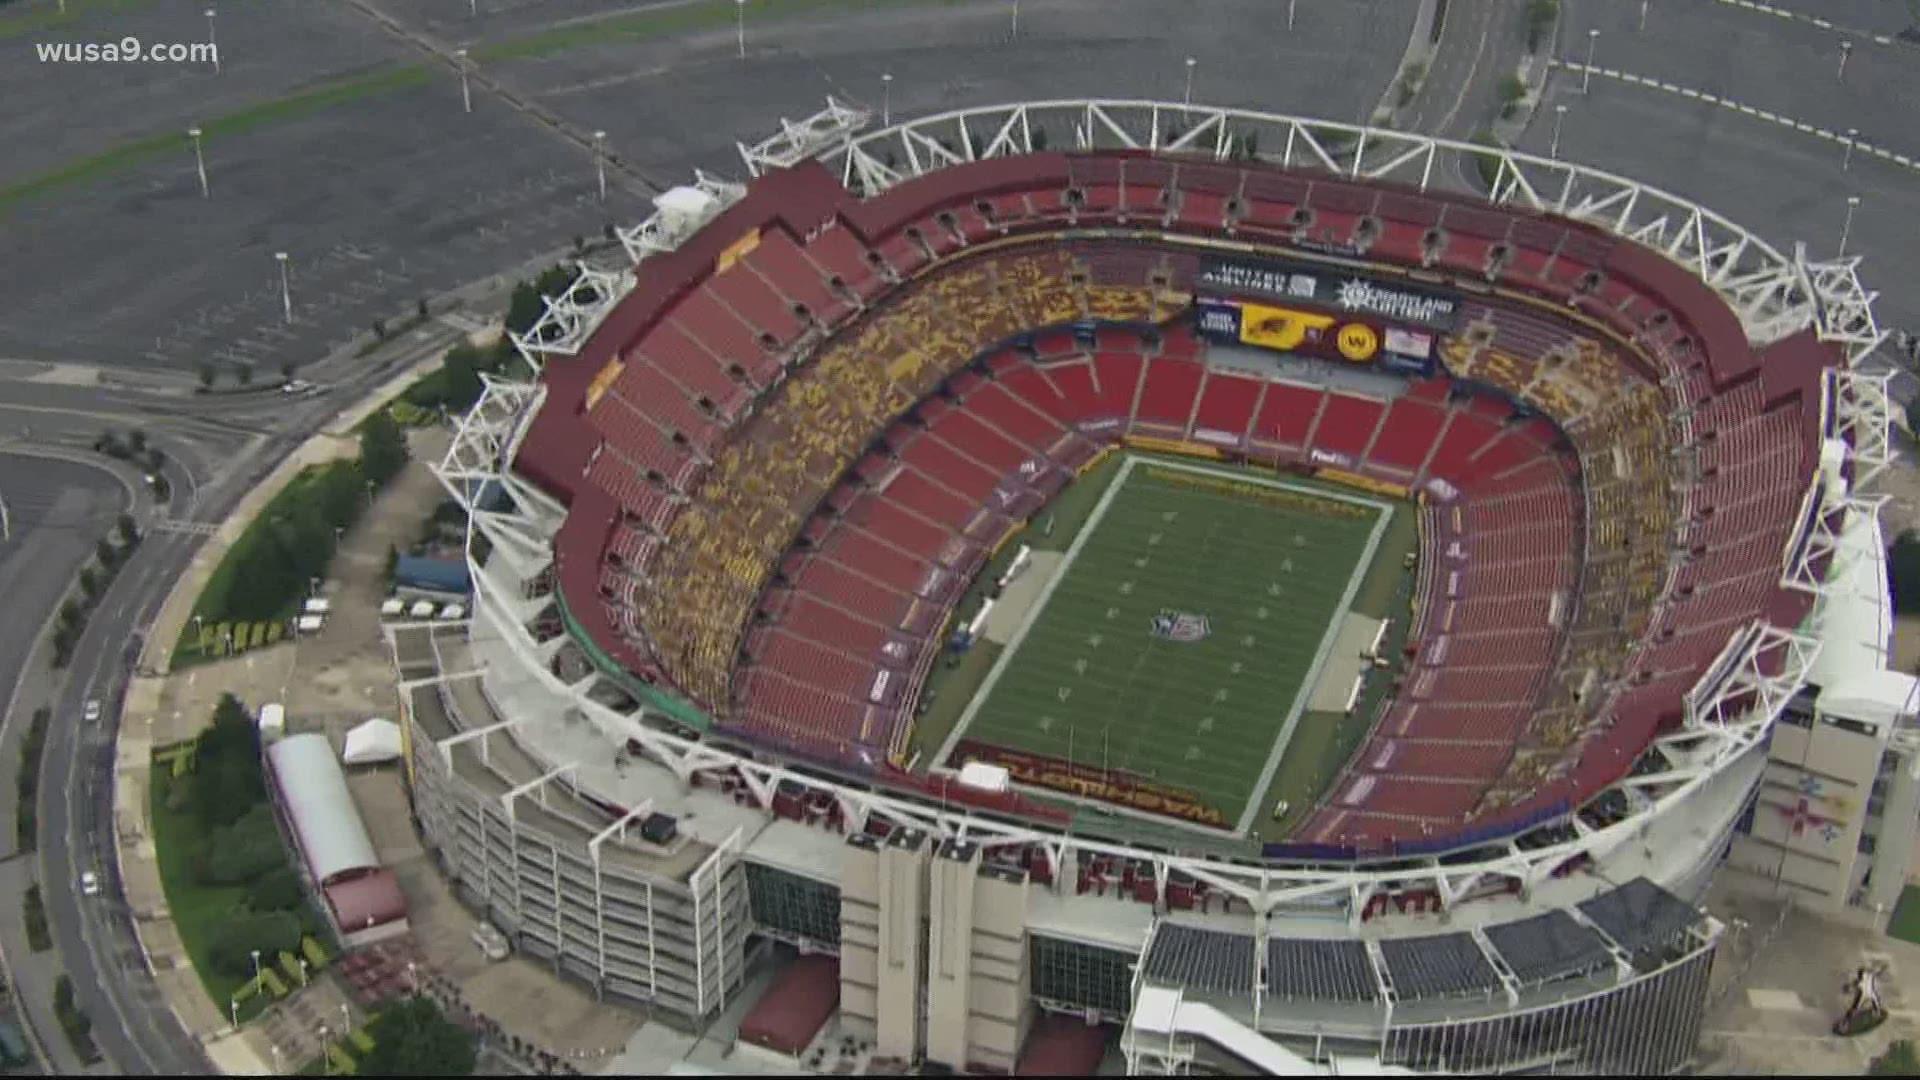 Washington Football Team No Fans At Fedex Field Wusa9 Com